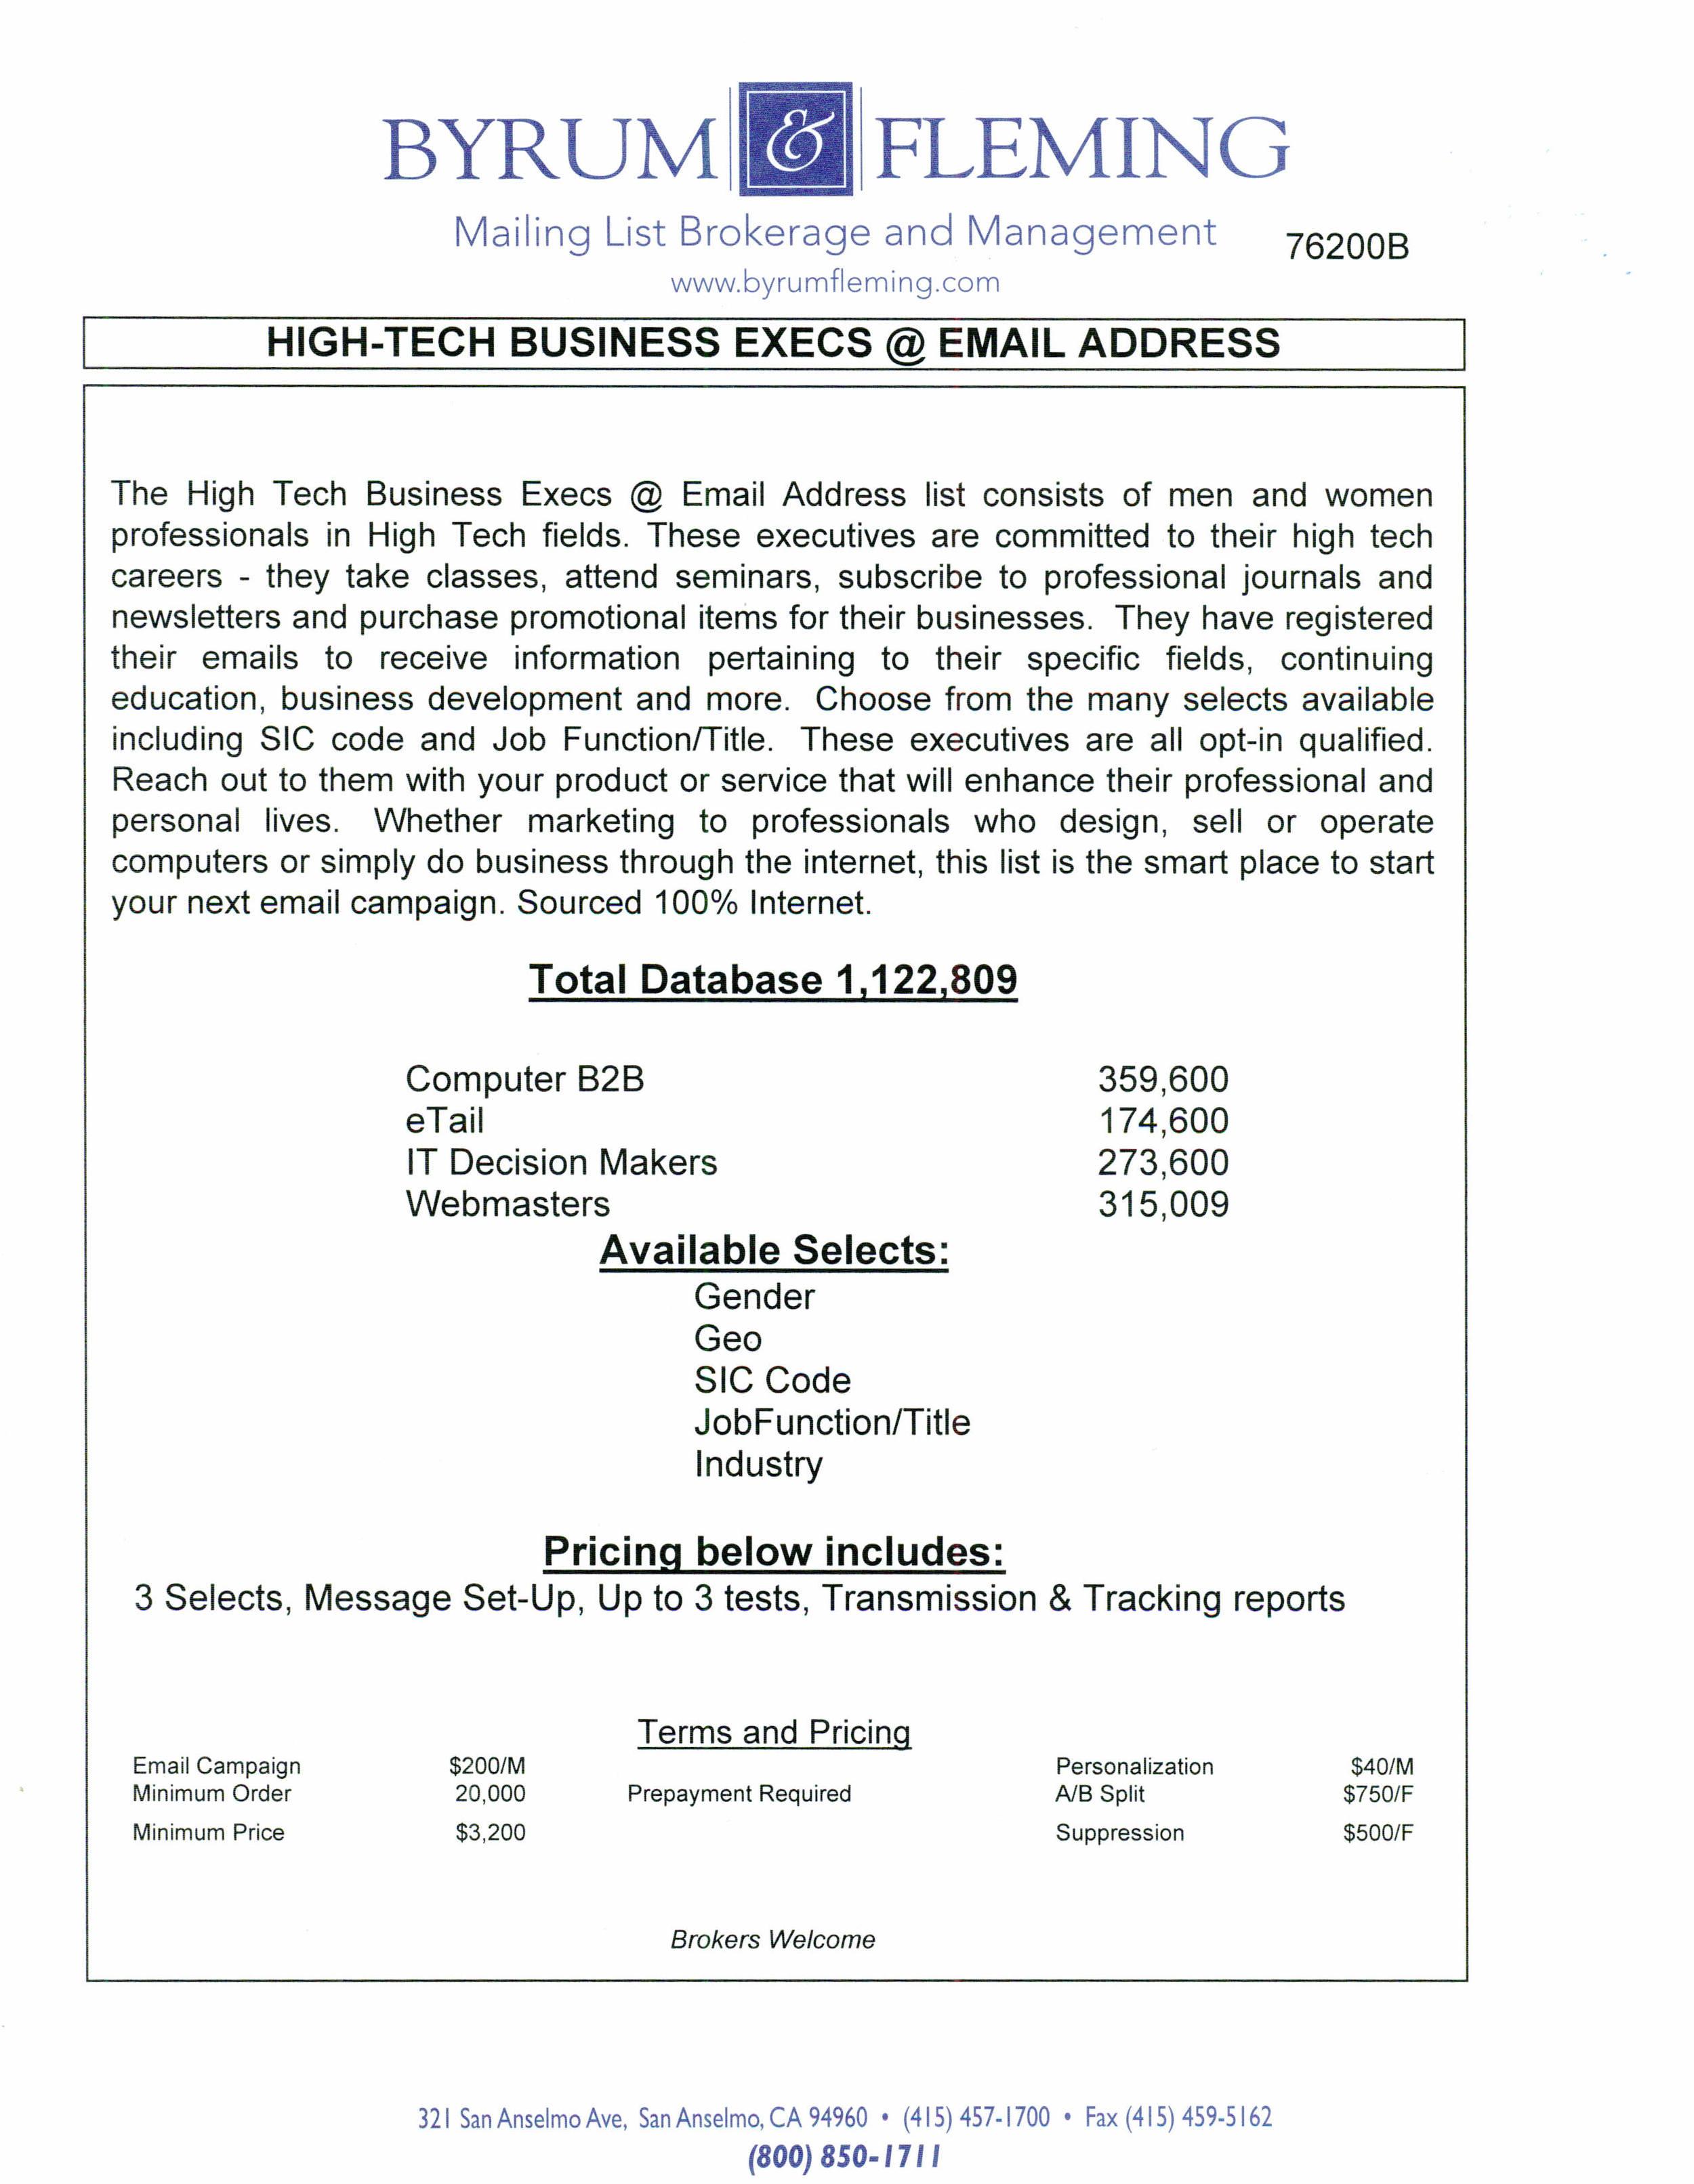 Computer B2B eTail IT Decision Makers Webmasters